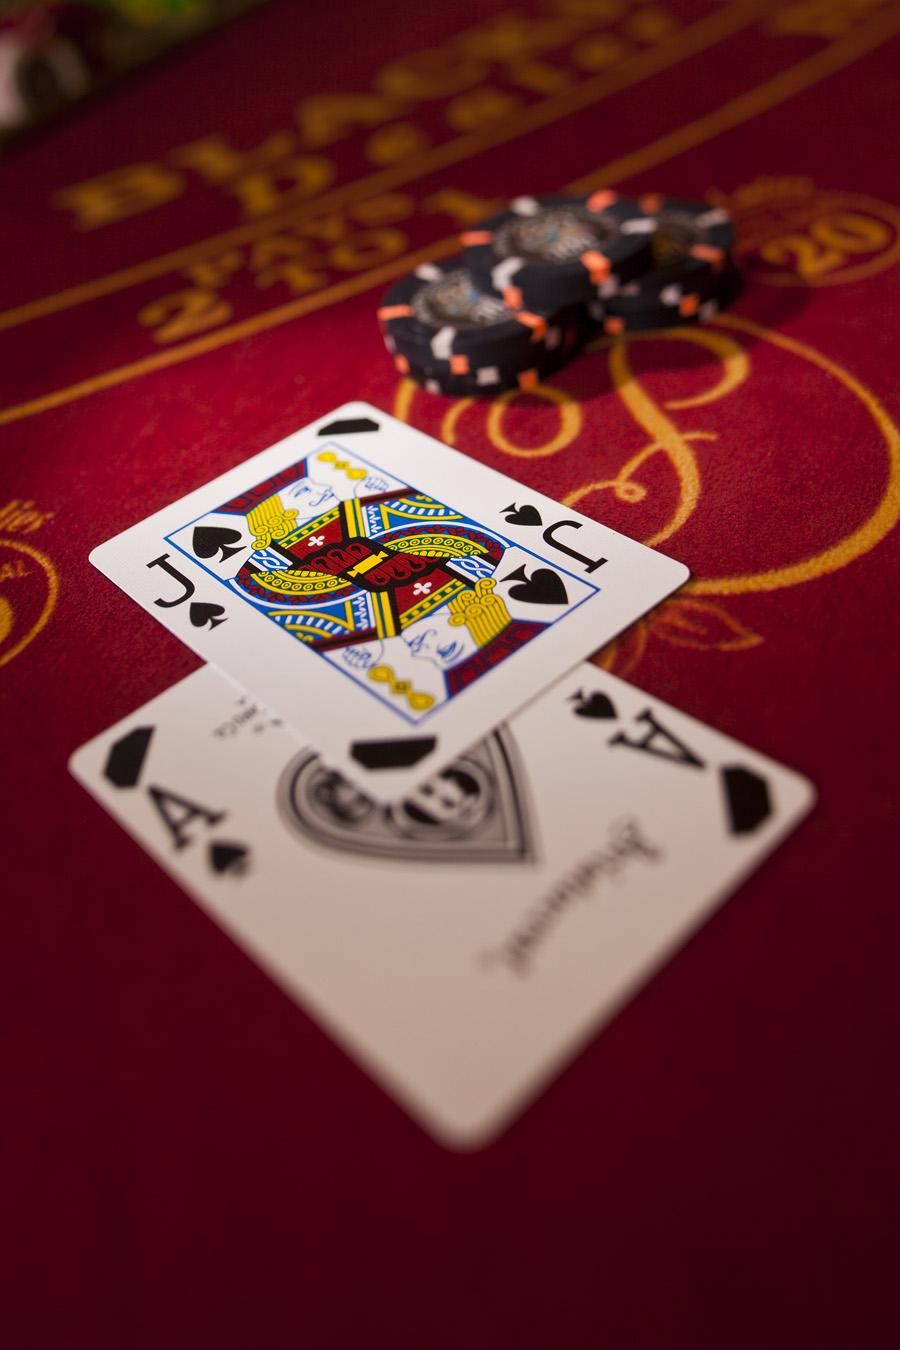 Blackjack : oser la martingale pour tourner sa chance